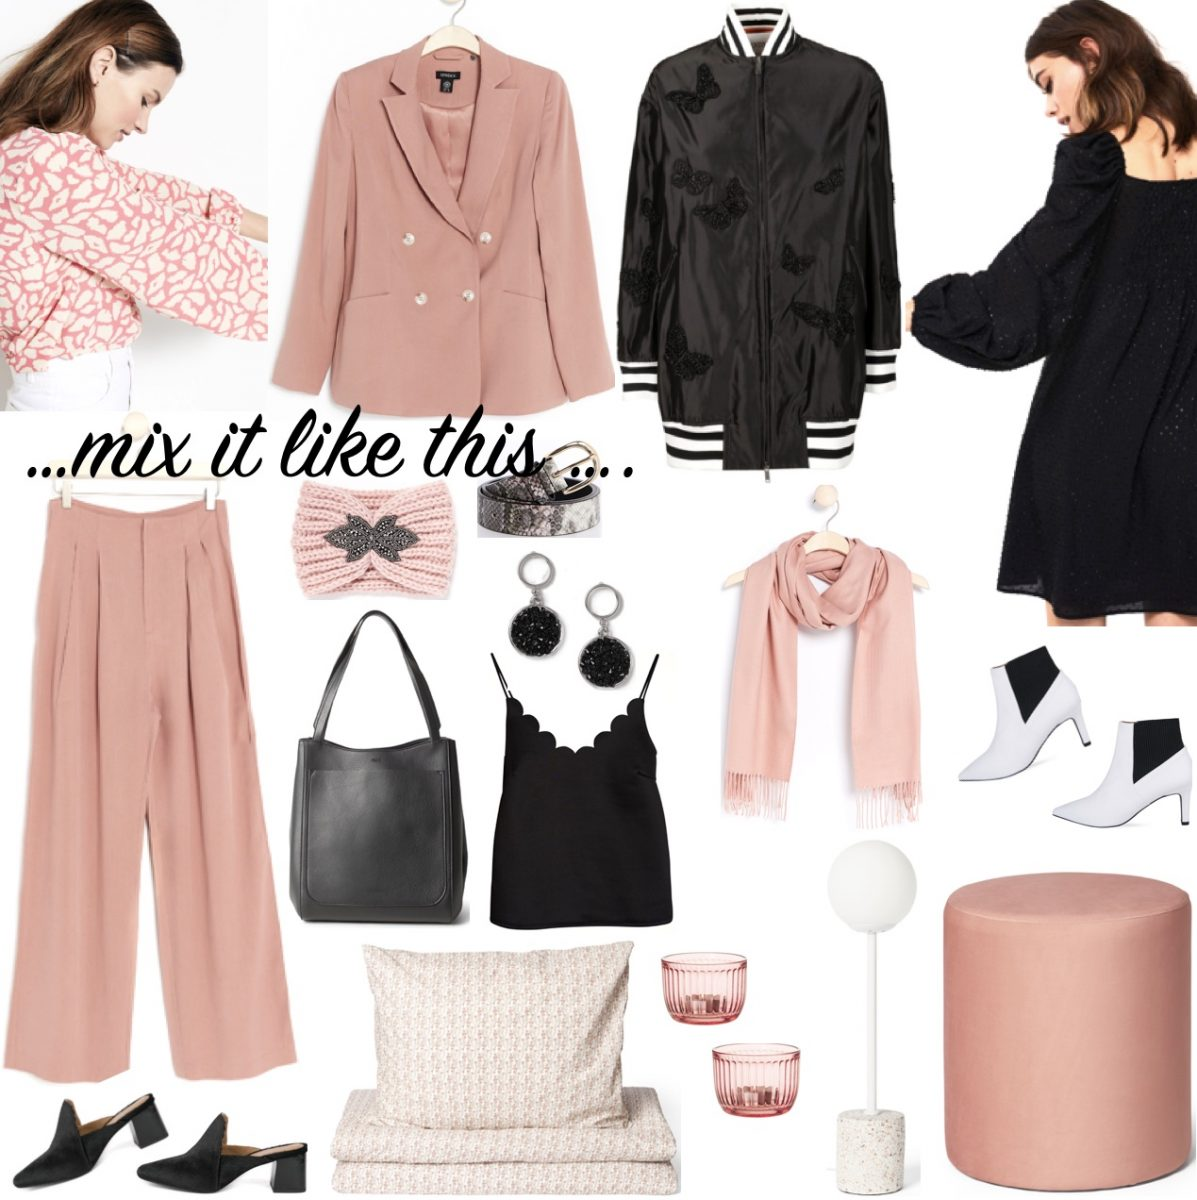 Monday Sweet Pink Inspiration